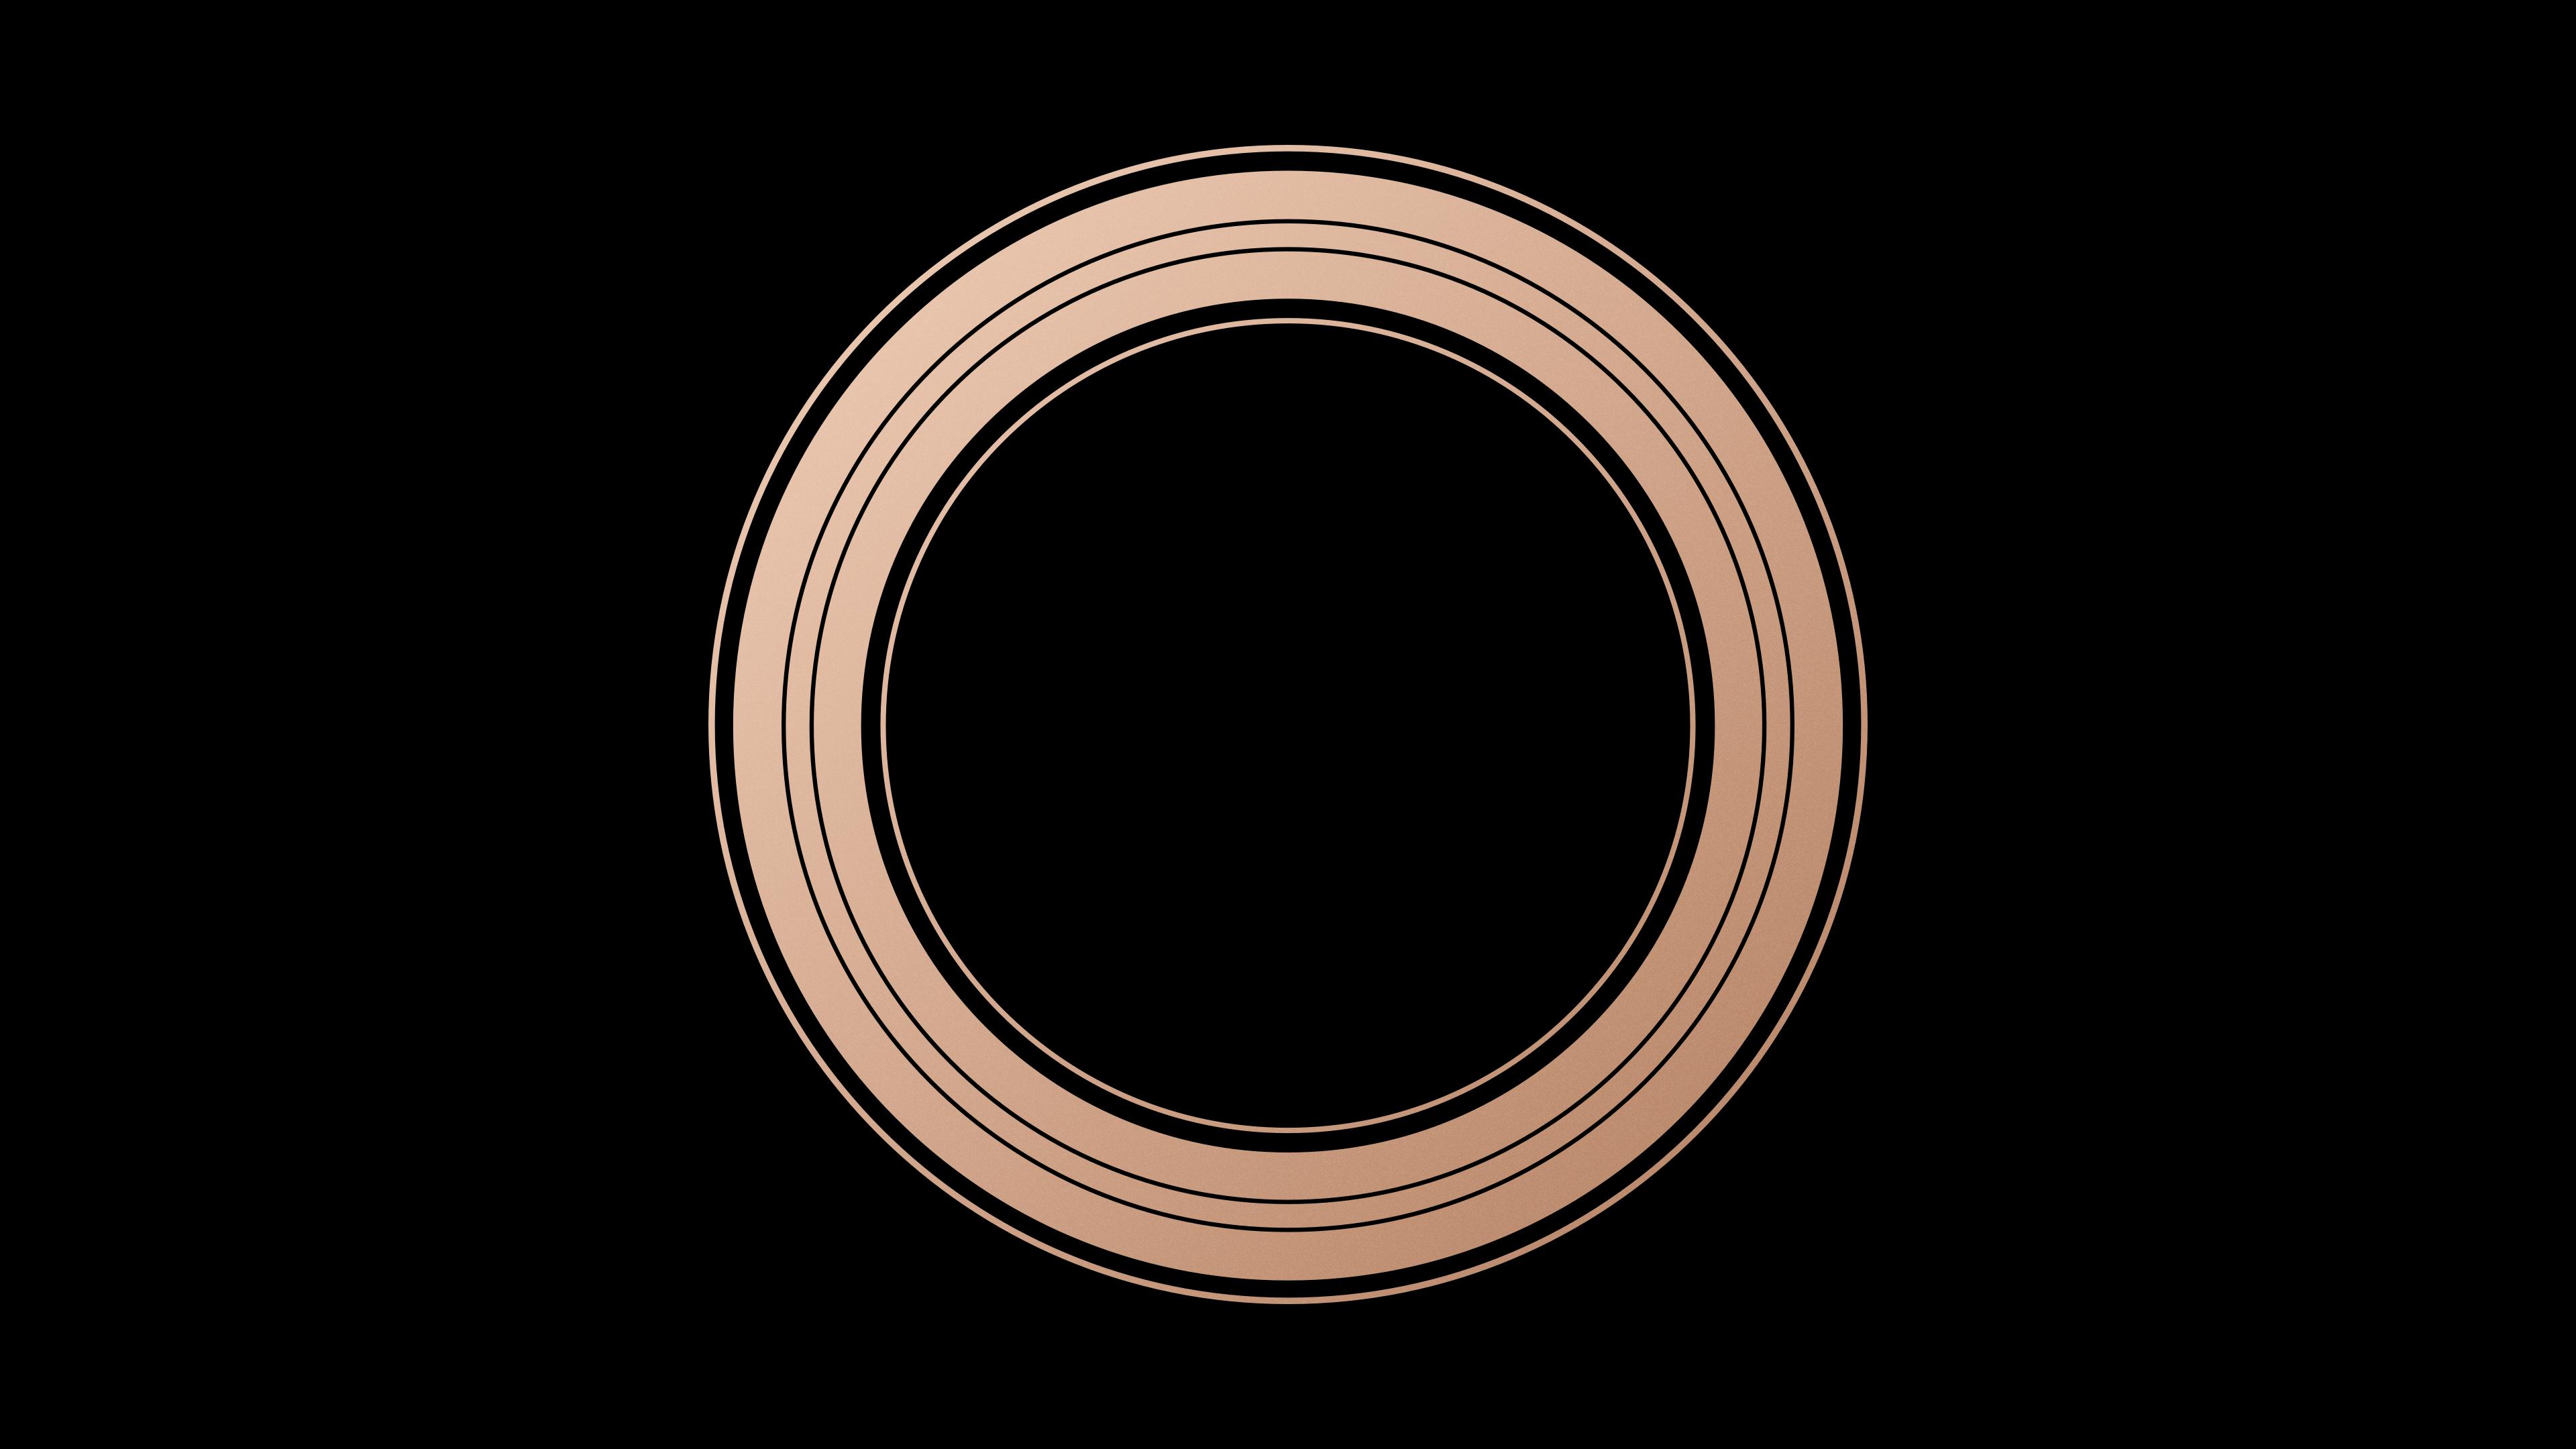 Apple Event Iphone